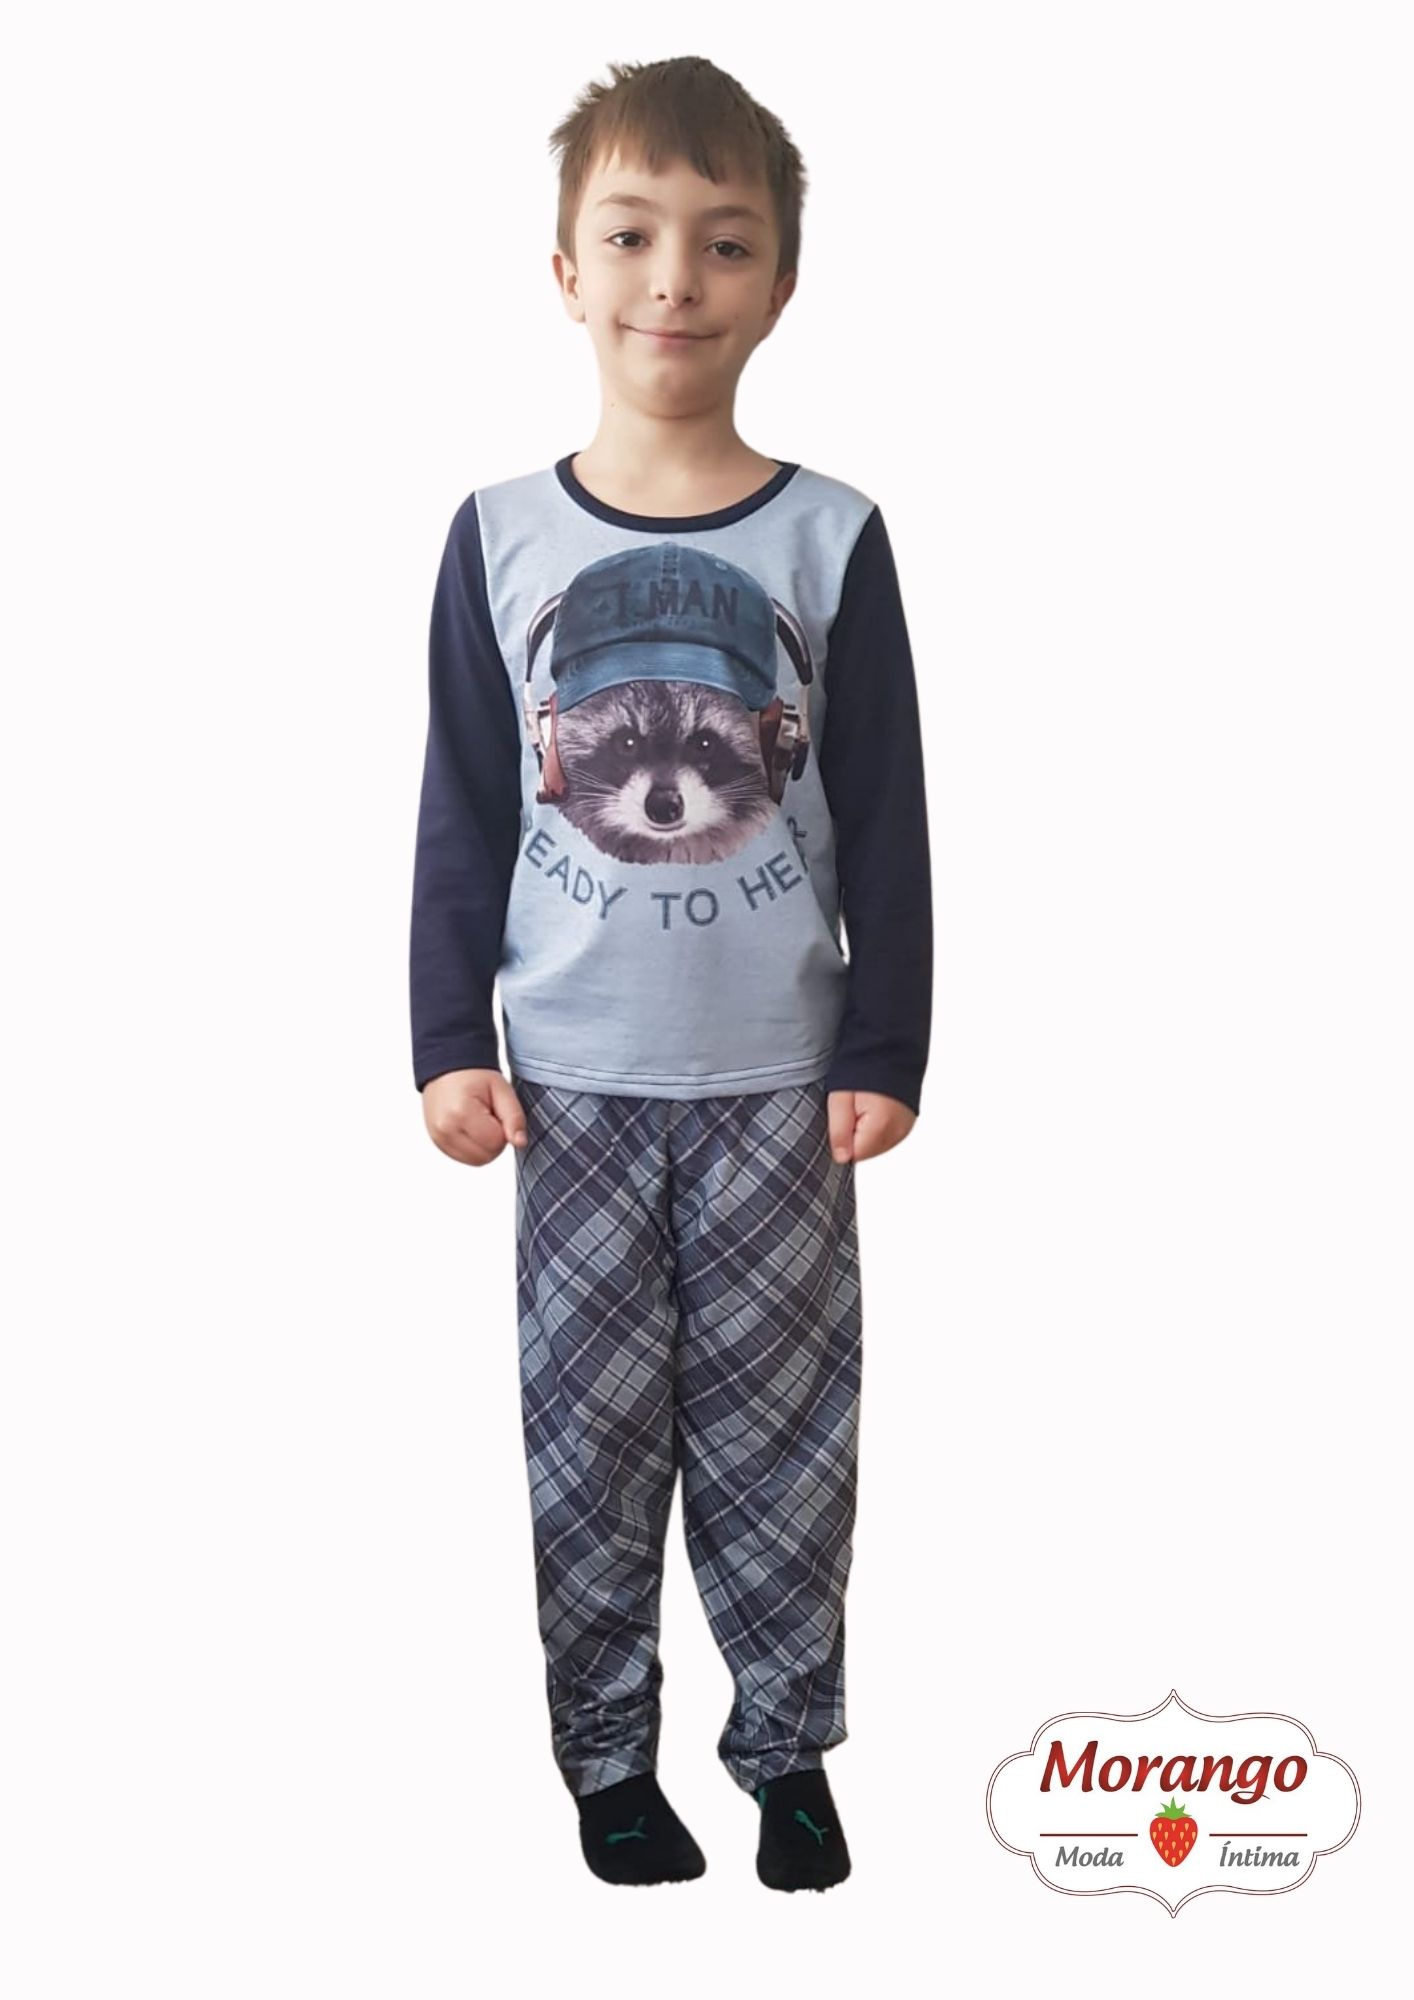 Pijama 4002 Manga Longa E CalÇa Molecoton